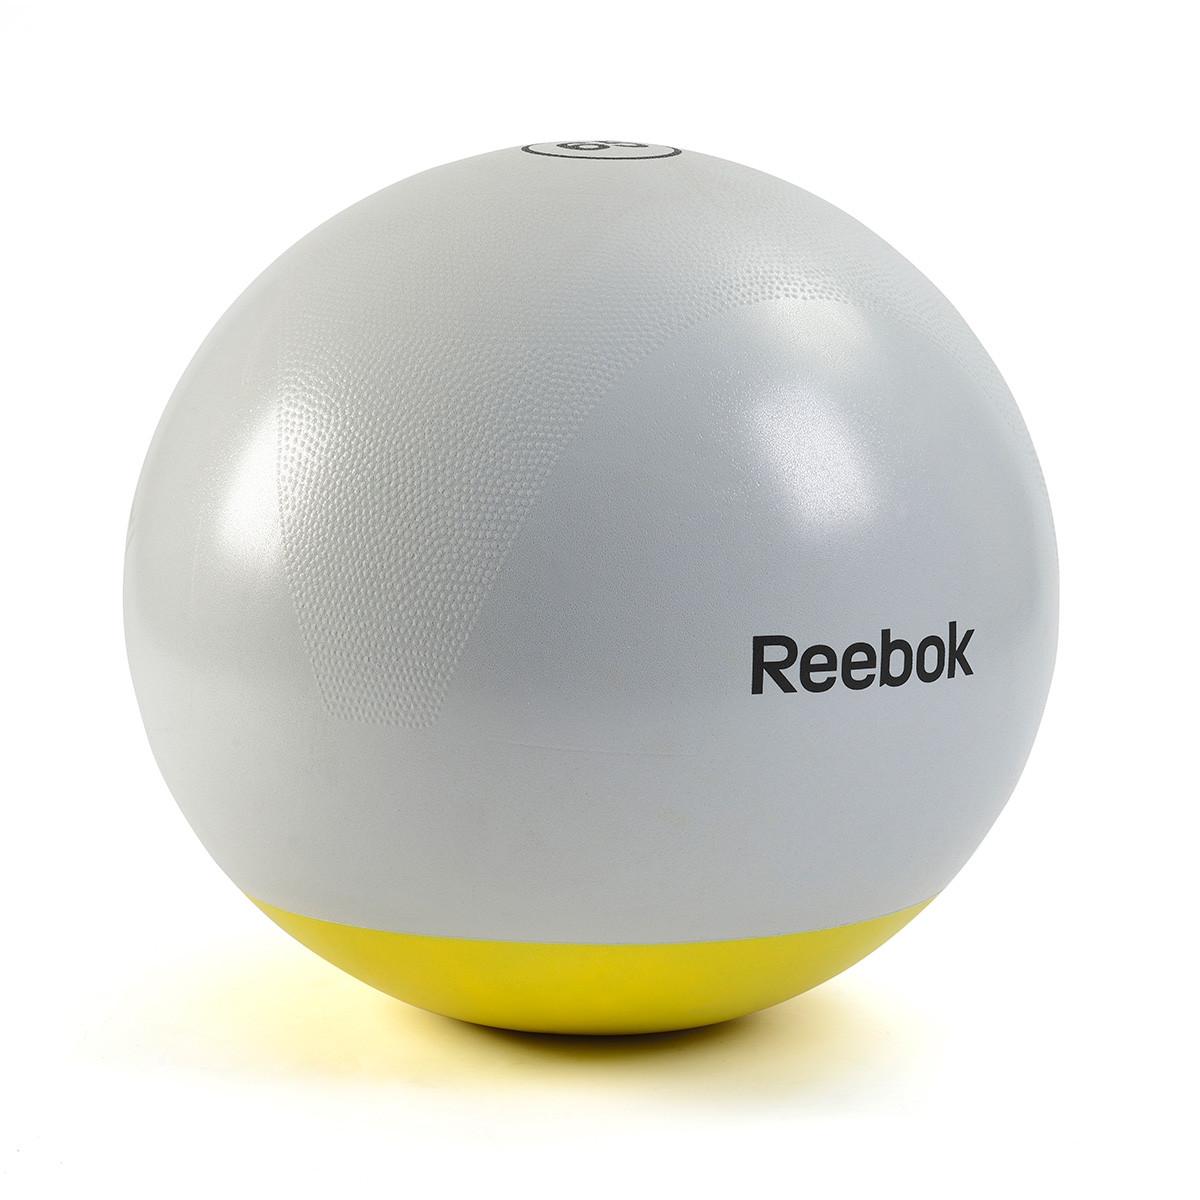 Мяч гимнастический Reebok RSB-10017 - 75 см серый/желтый